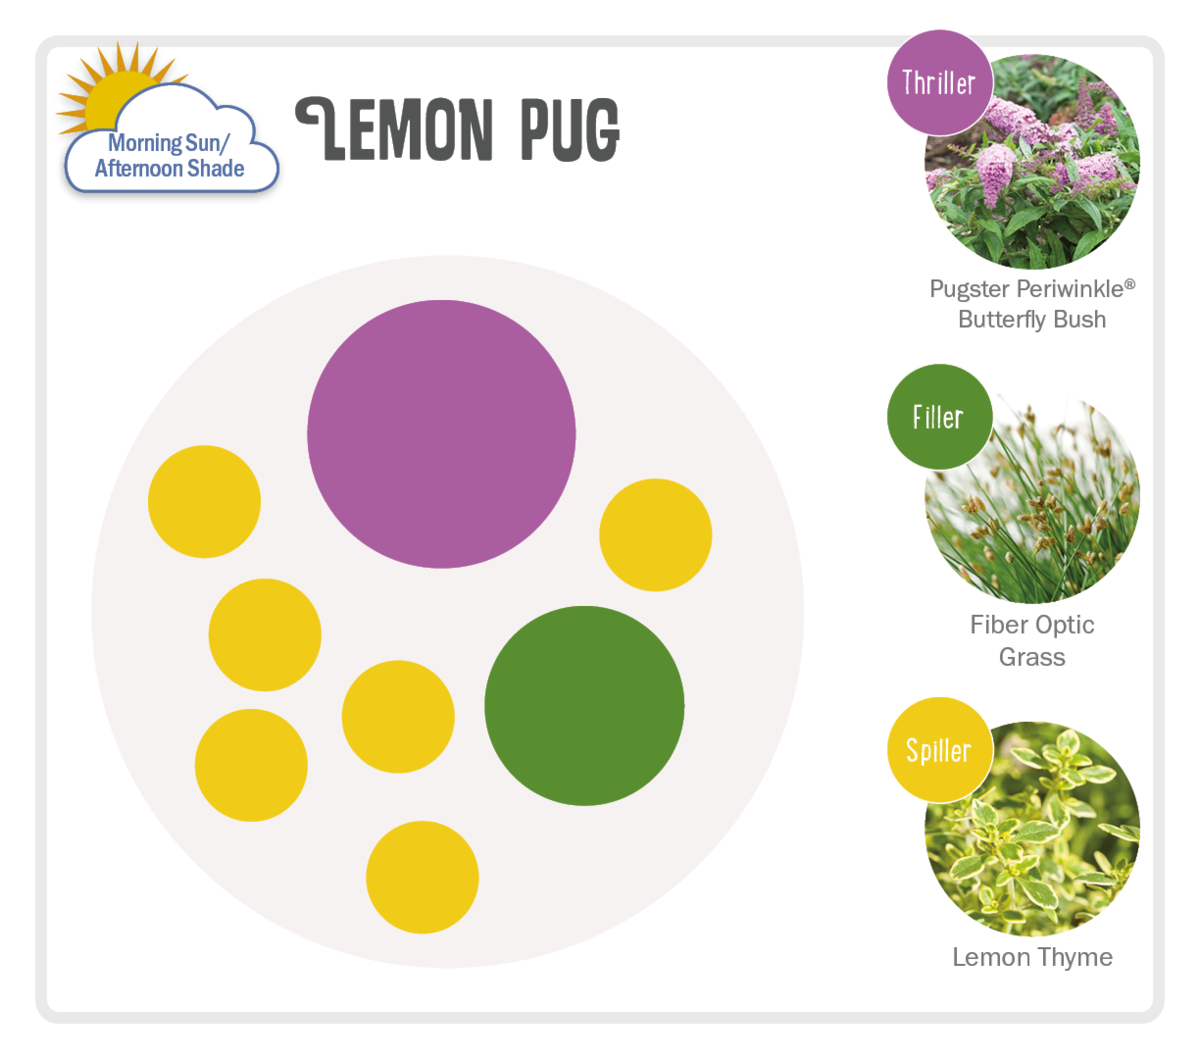 Image of Lemon Pug Pot-Up Recipe